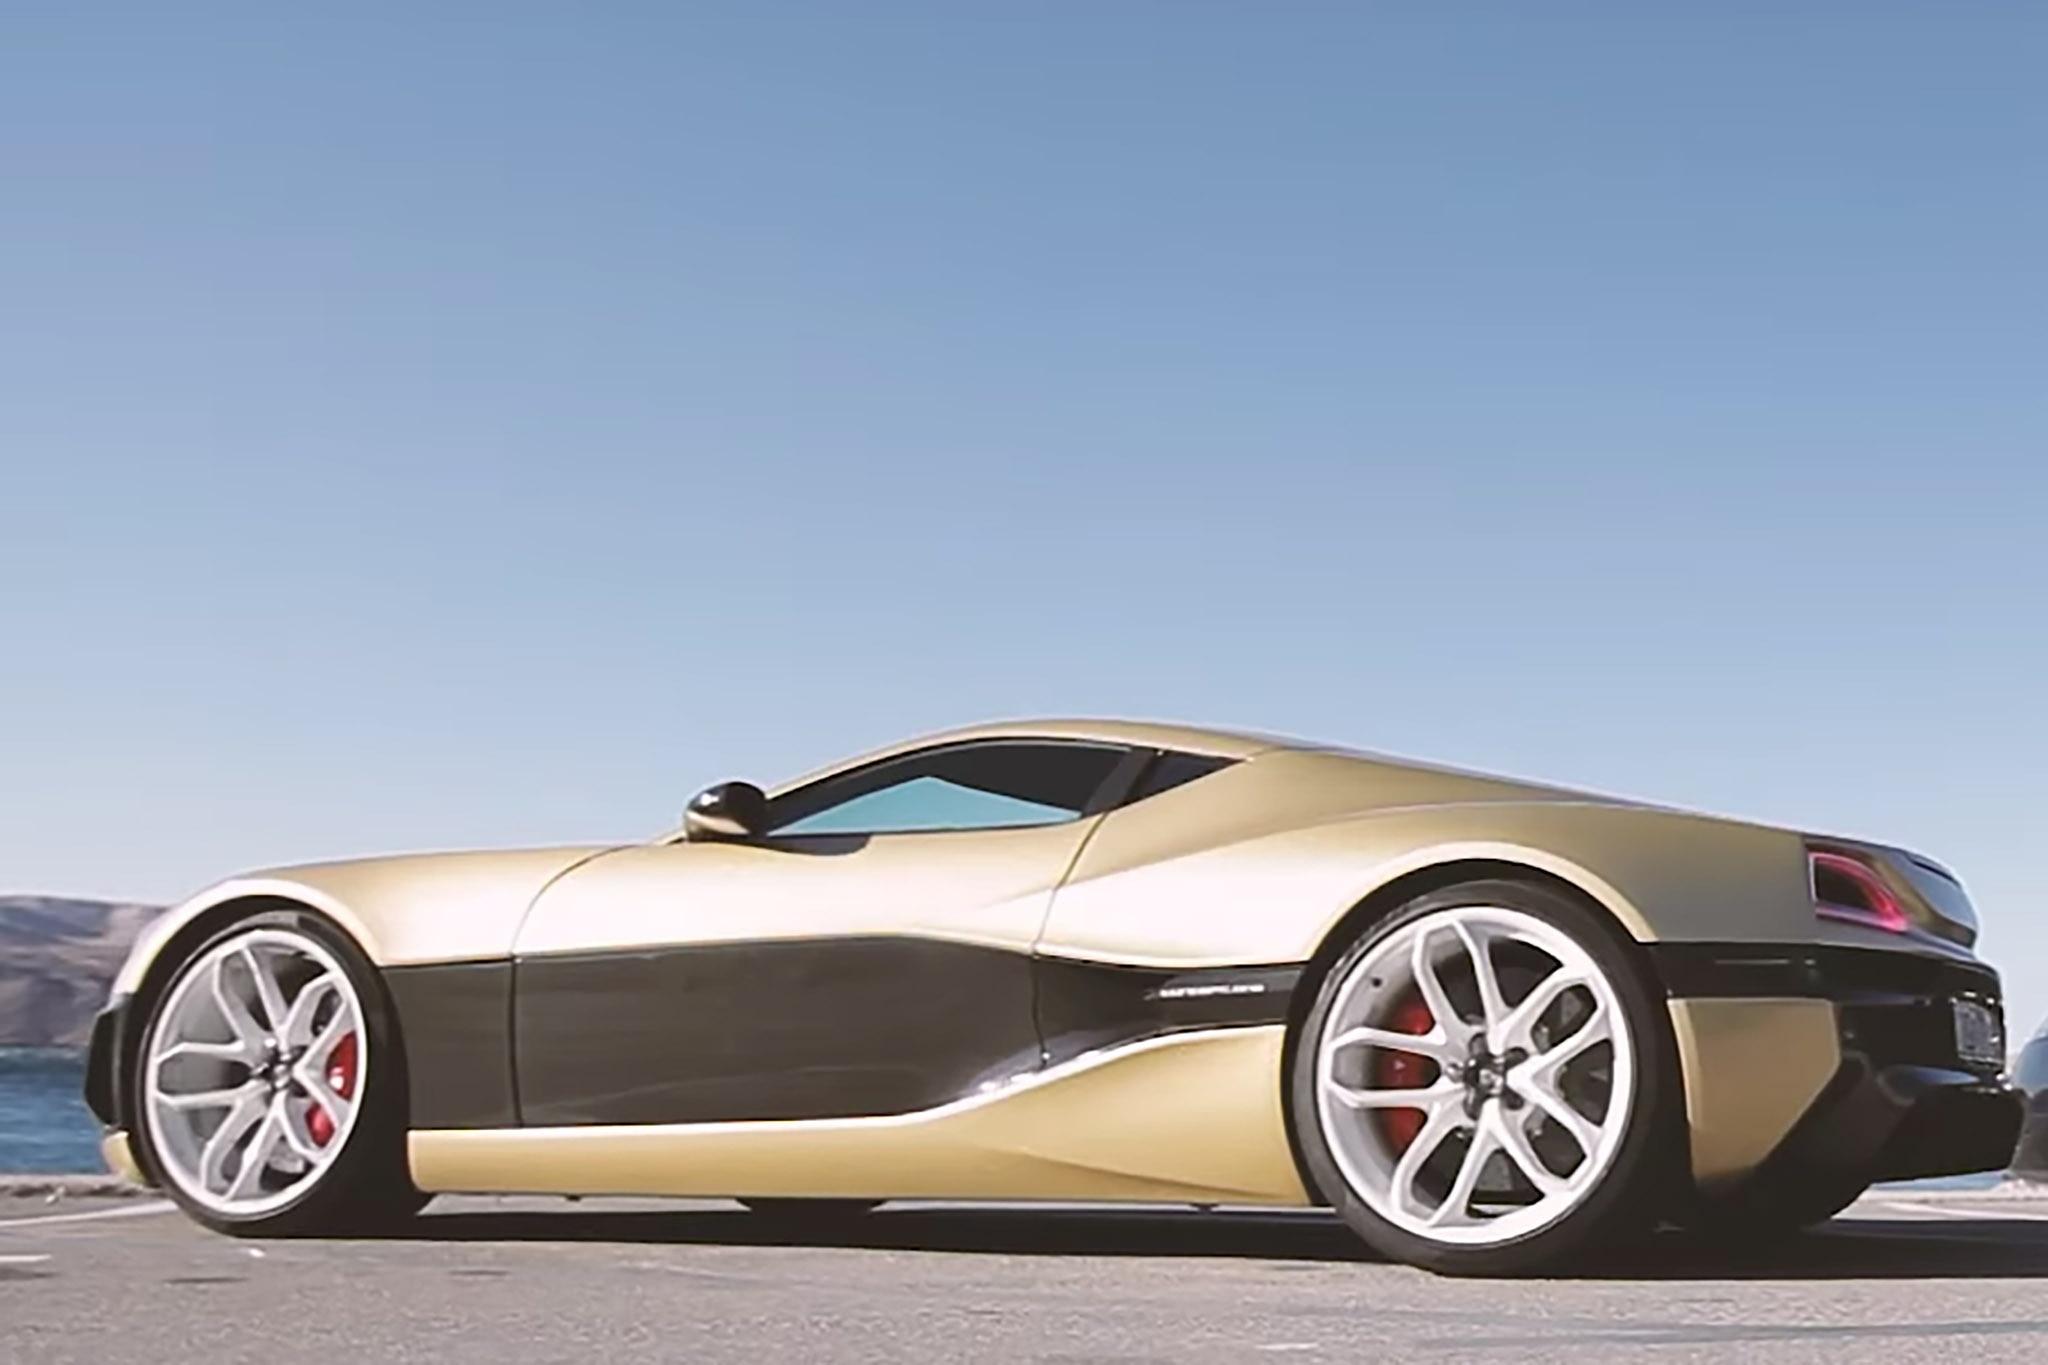 Rimac Concept One Versus Bugatti Veyron | Automobile Magazine